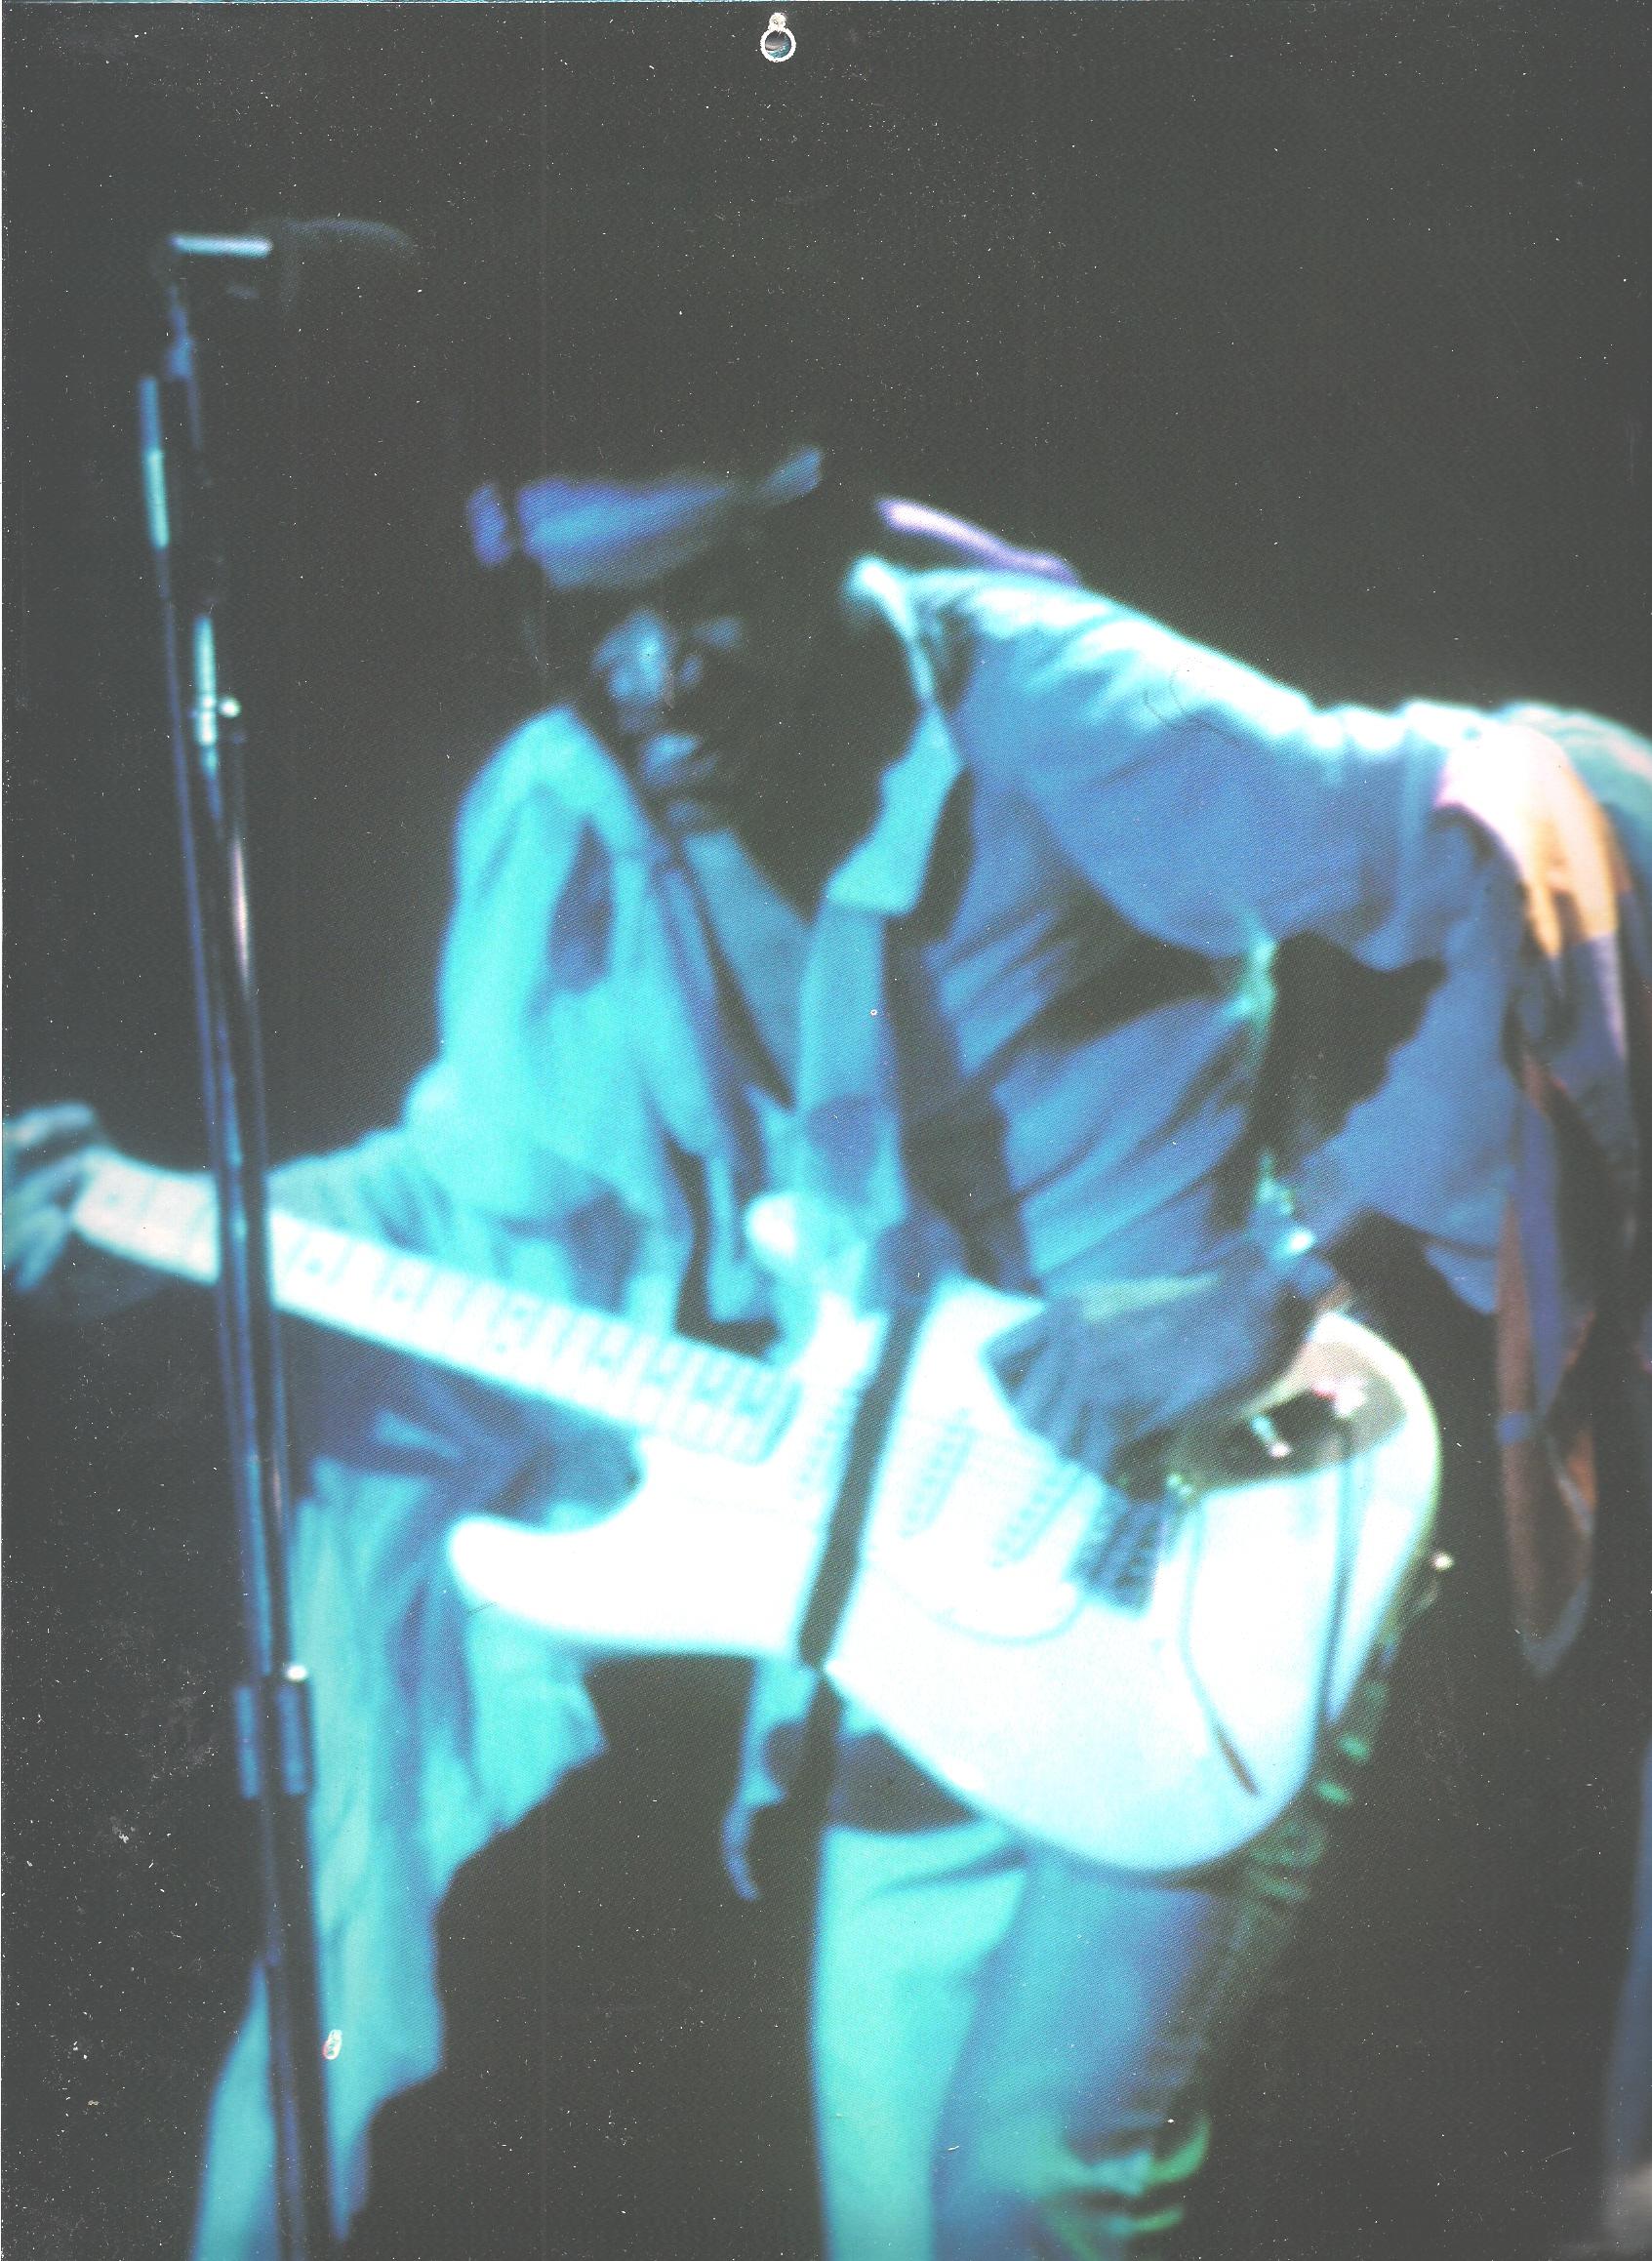 Live At Berkeley (2003) 75ed3858f1946c77d1f514e80c691fcf